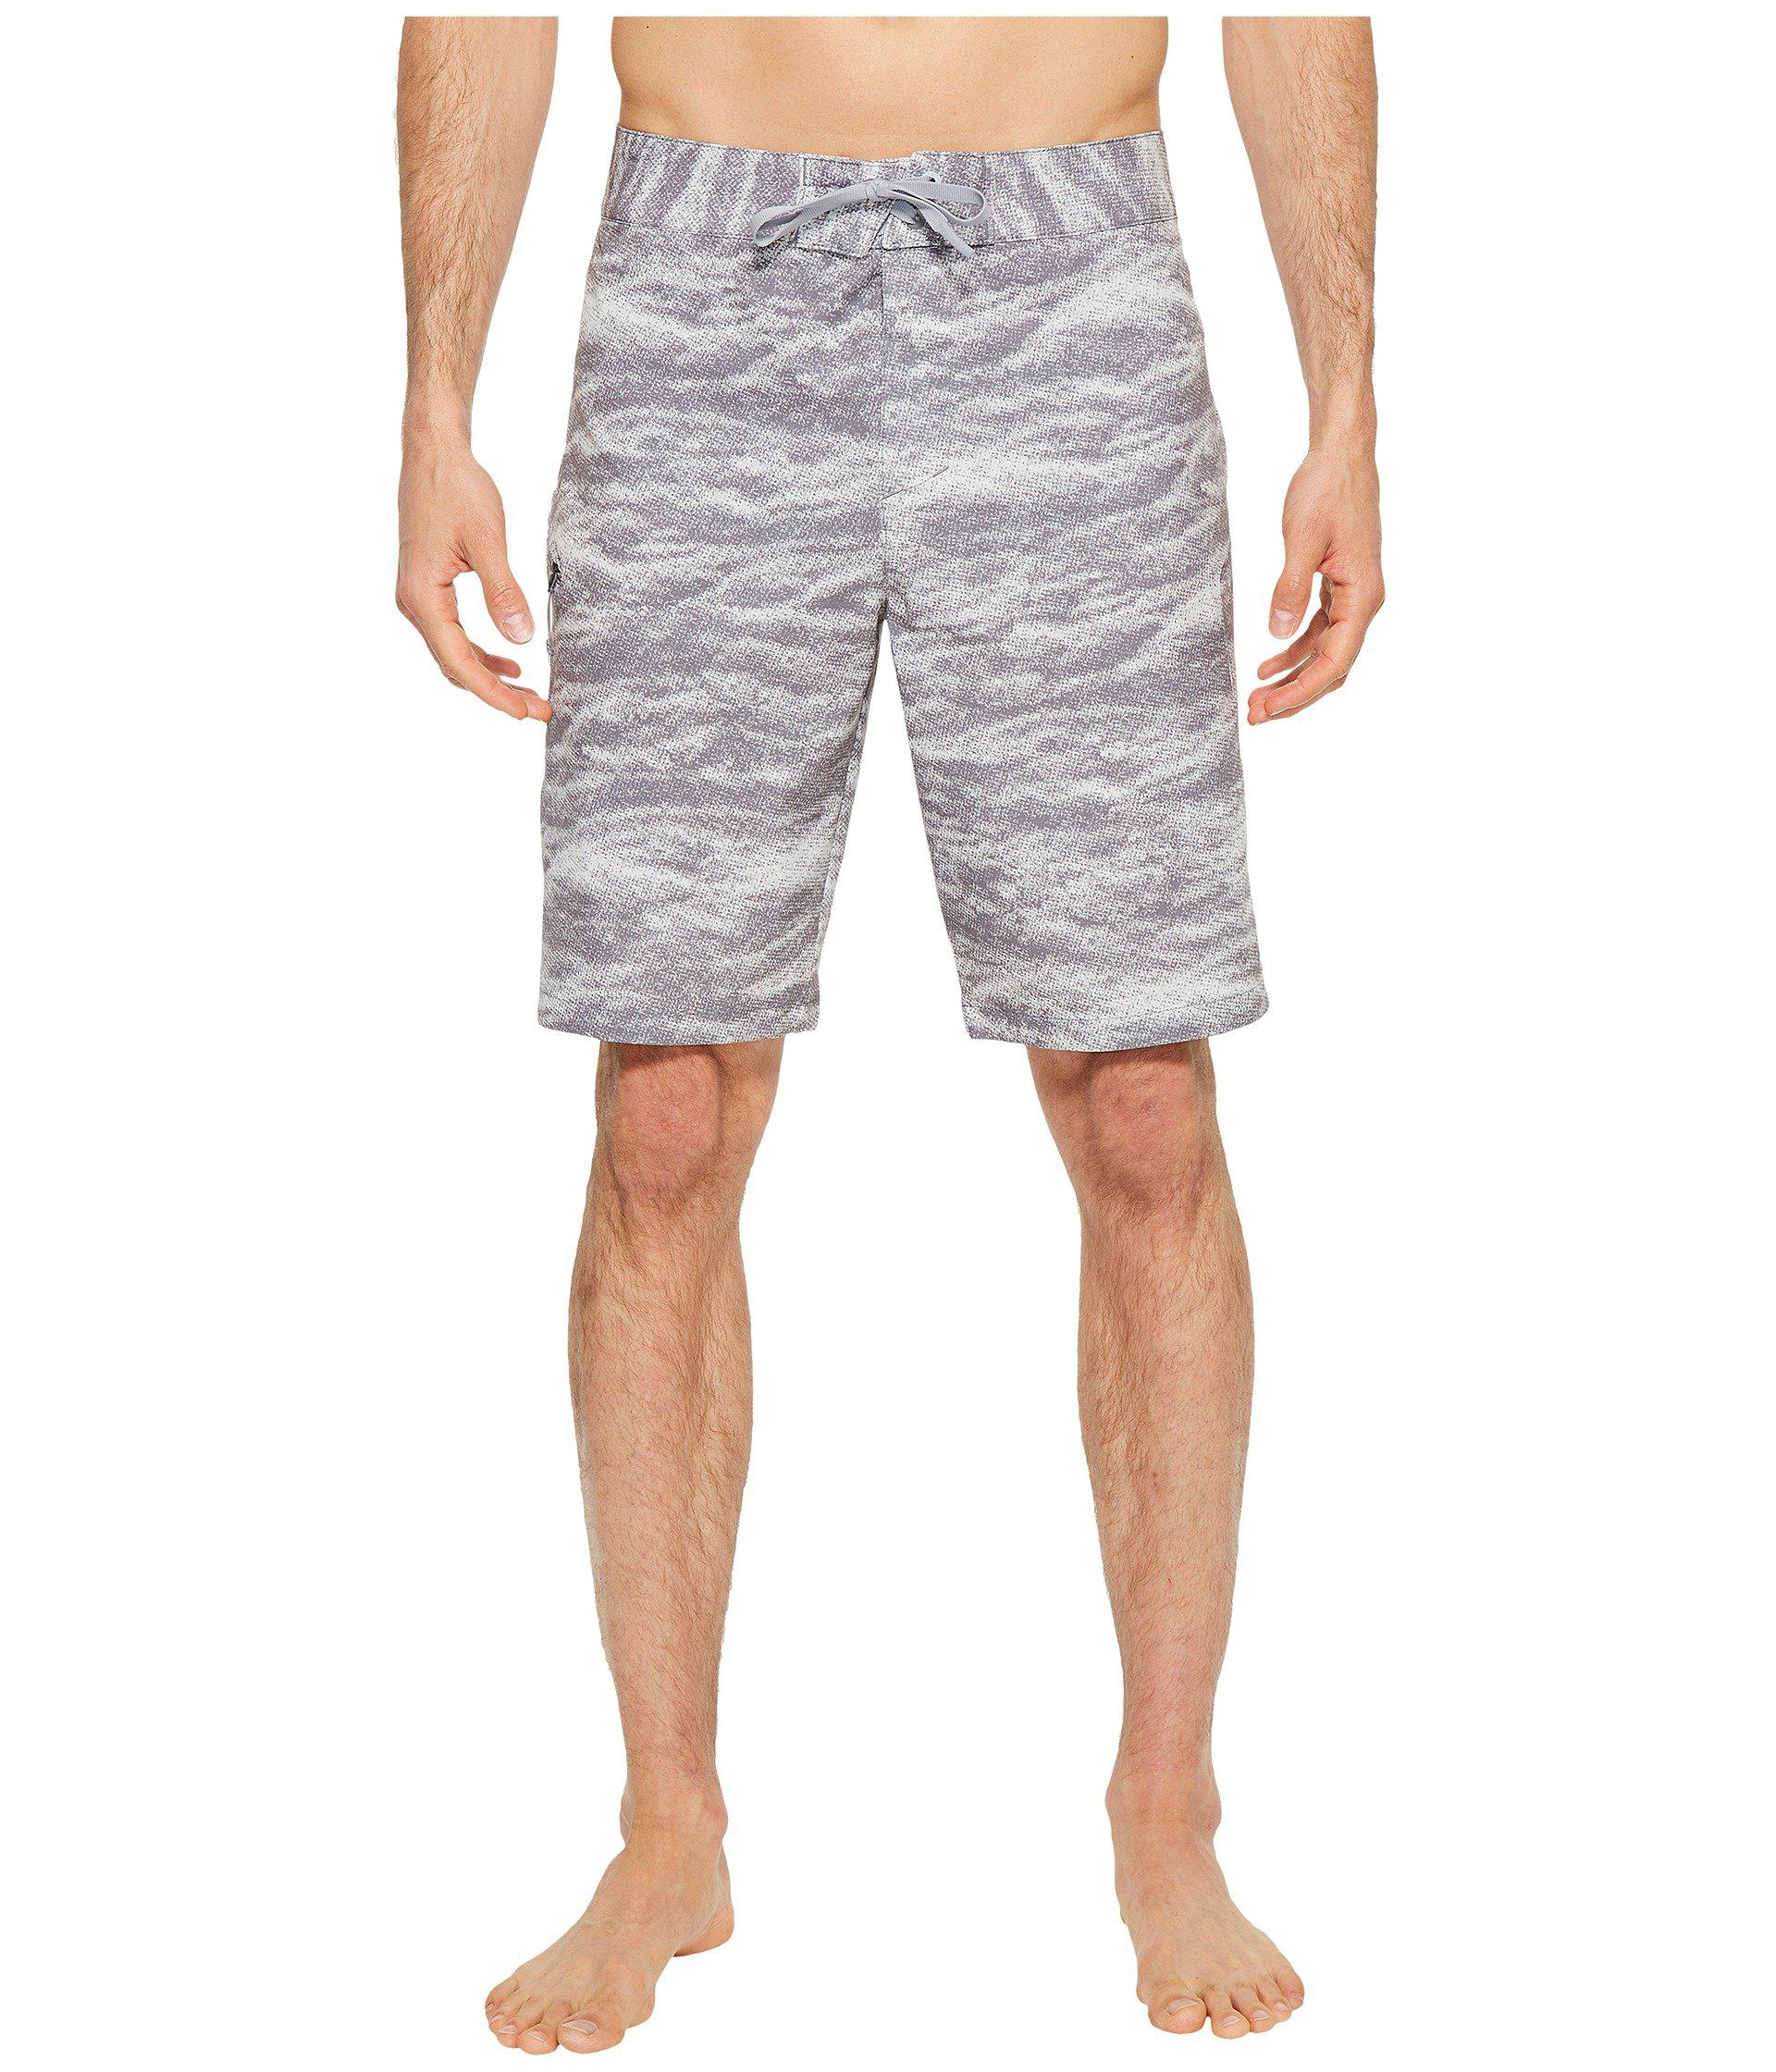 08e618c82d Under Armour Ua Reblek Printed Boardshorts in Gray for Men - Lyst